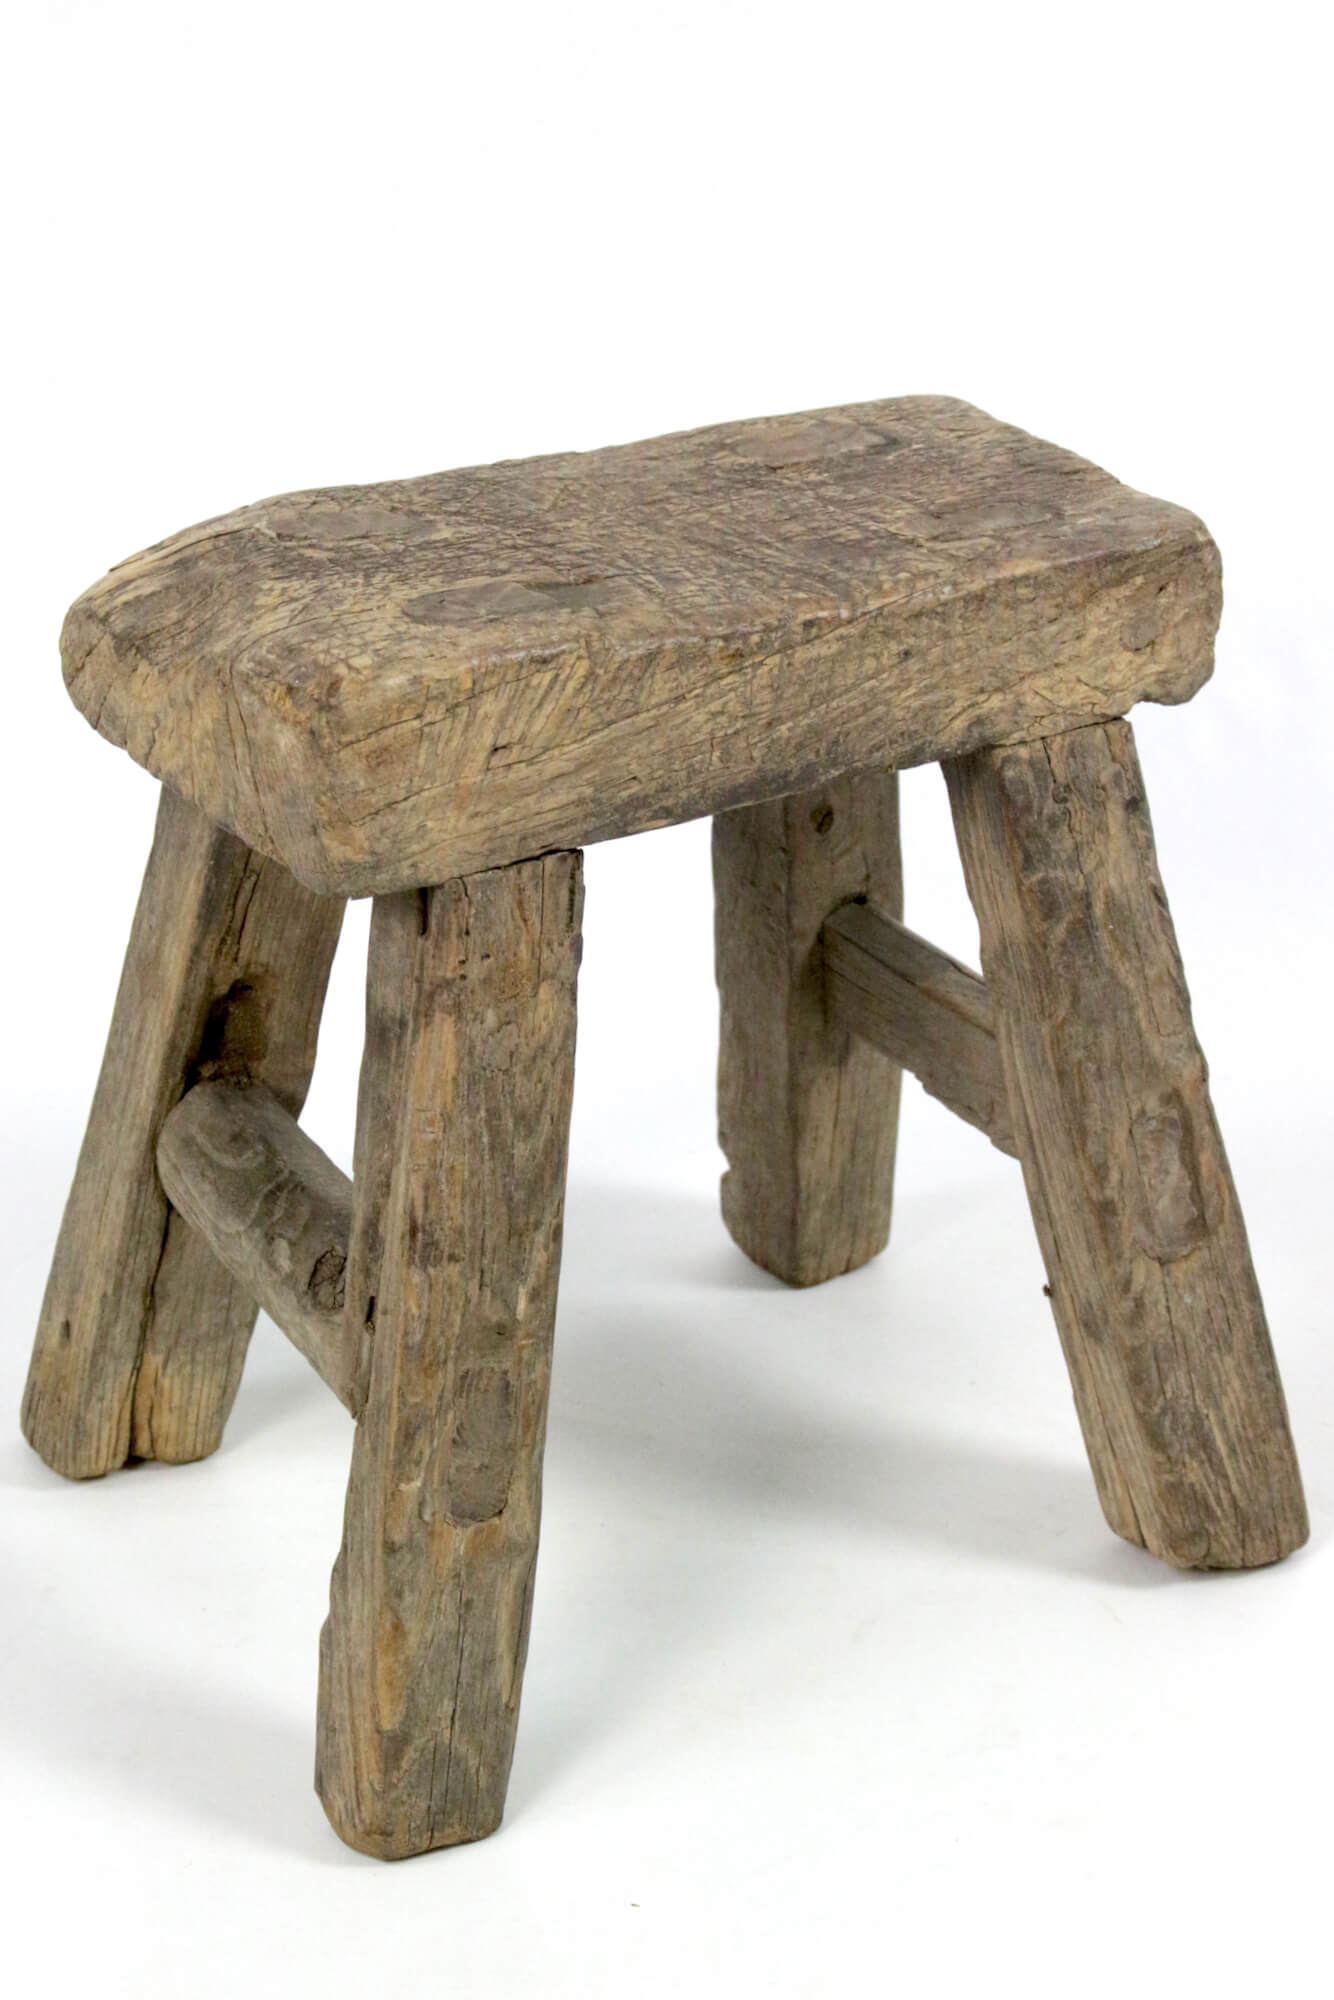 Derber-Schemel aus Holz antik